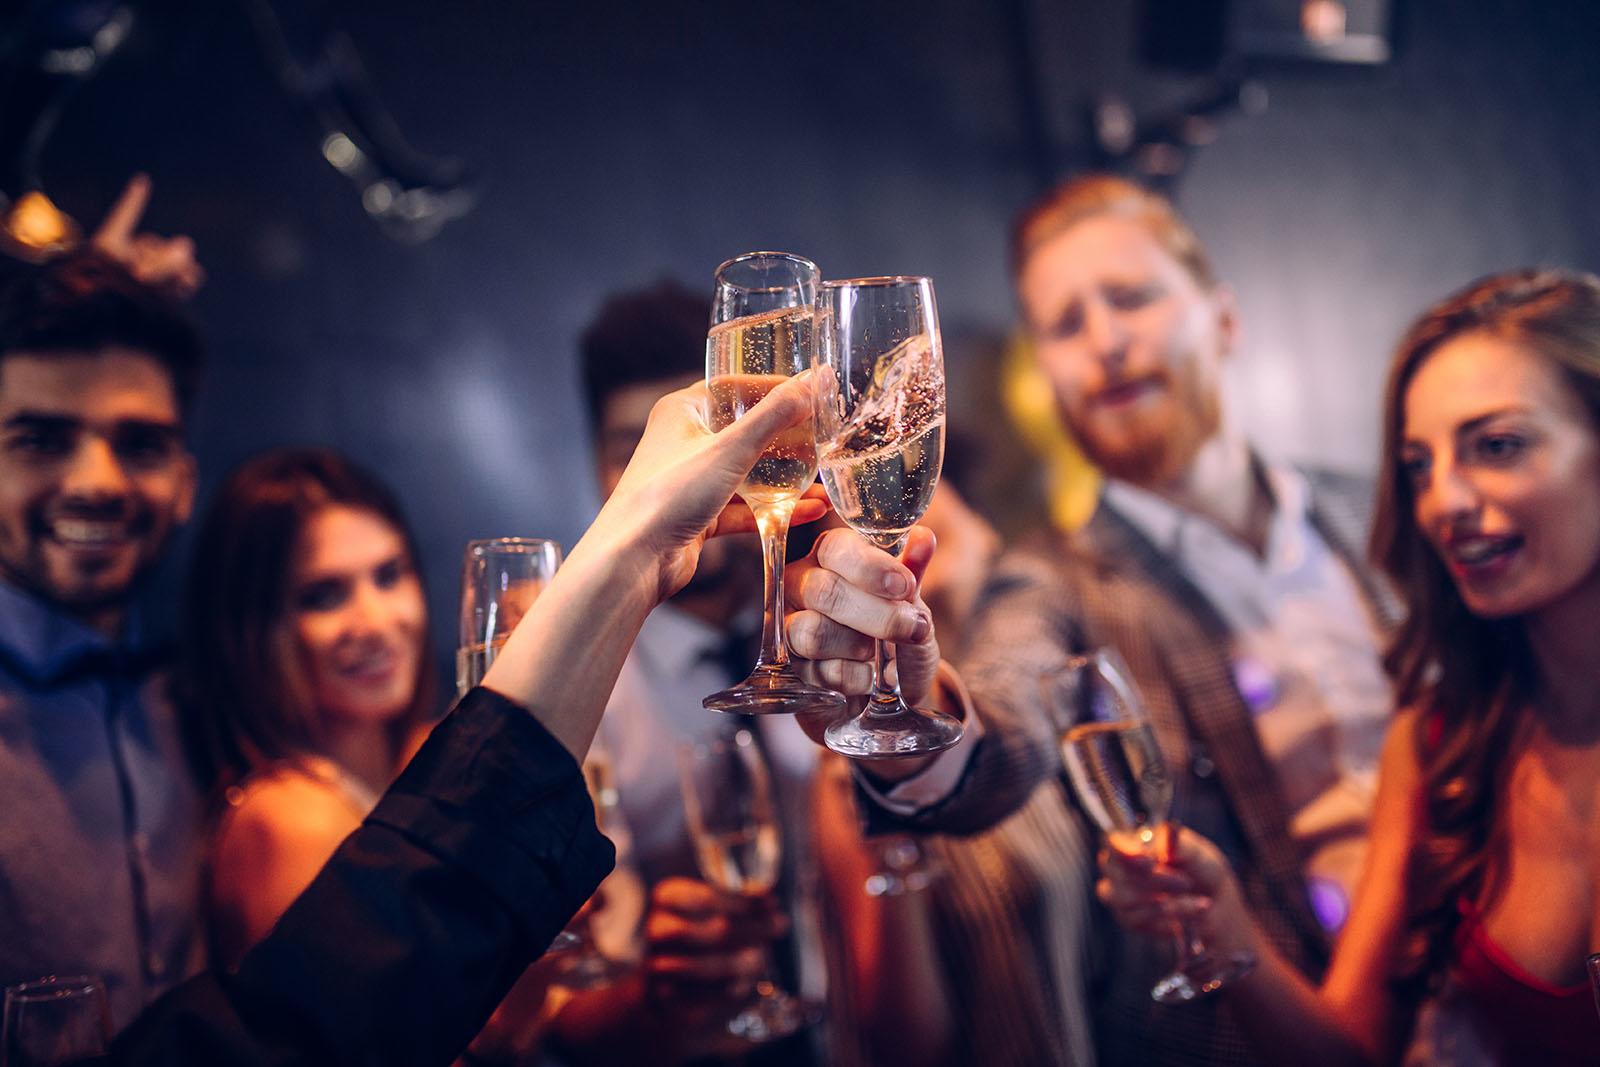 drinks and celebration